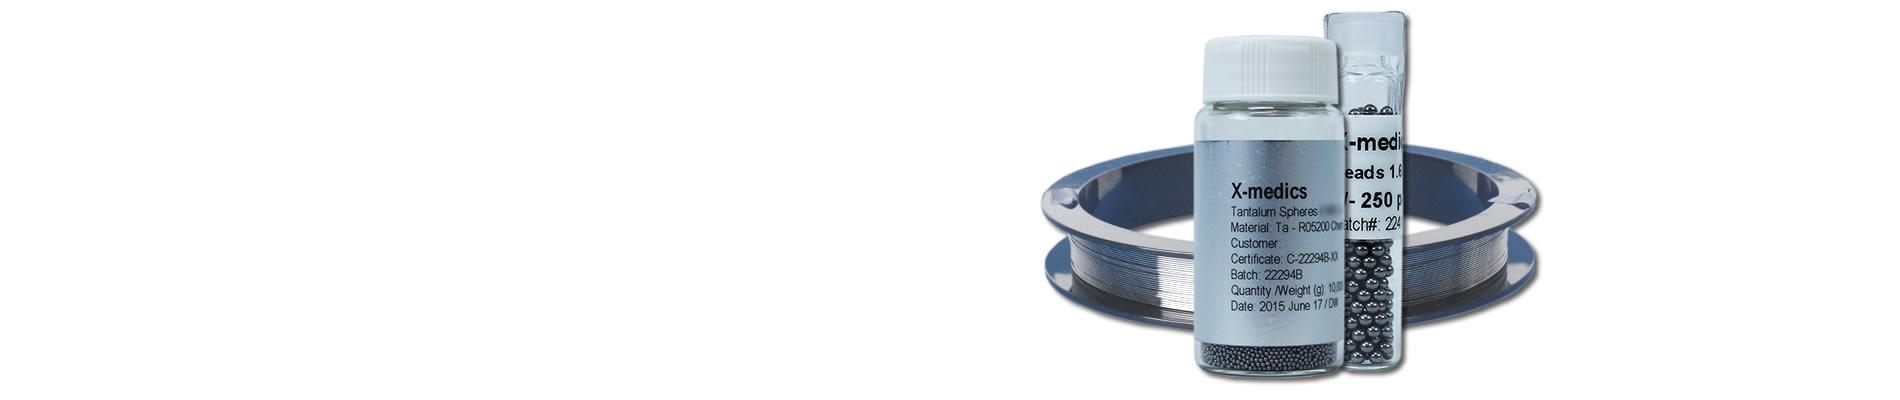 Tantalum medical grade products